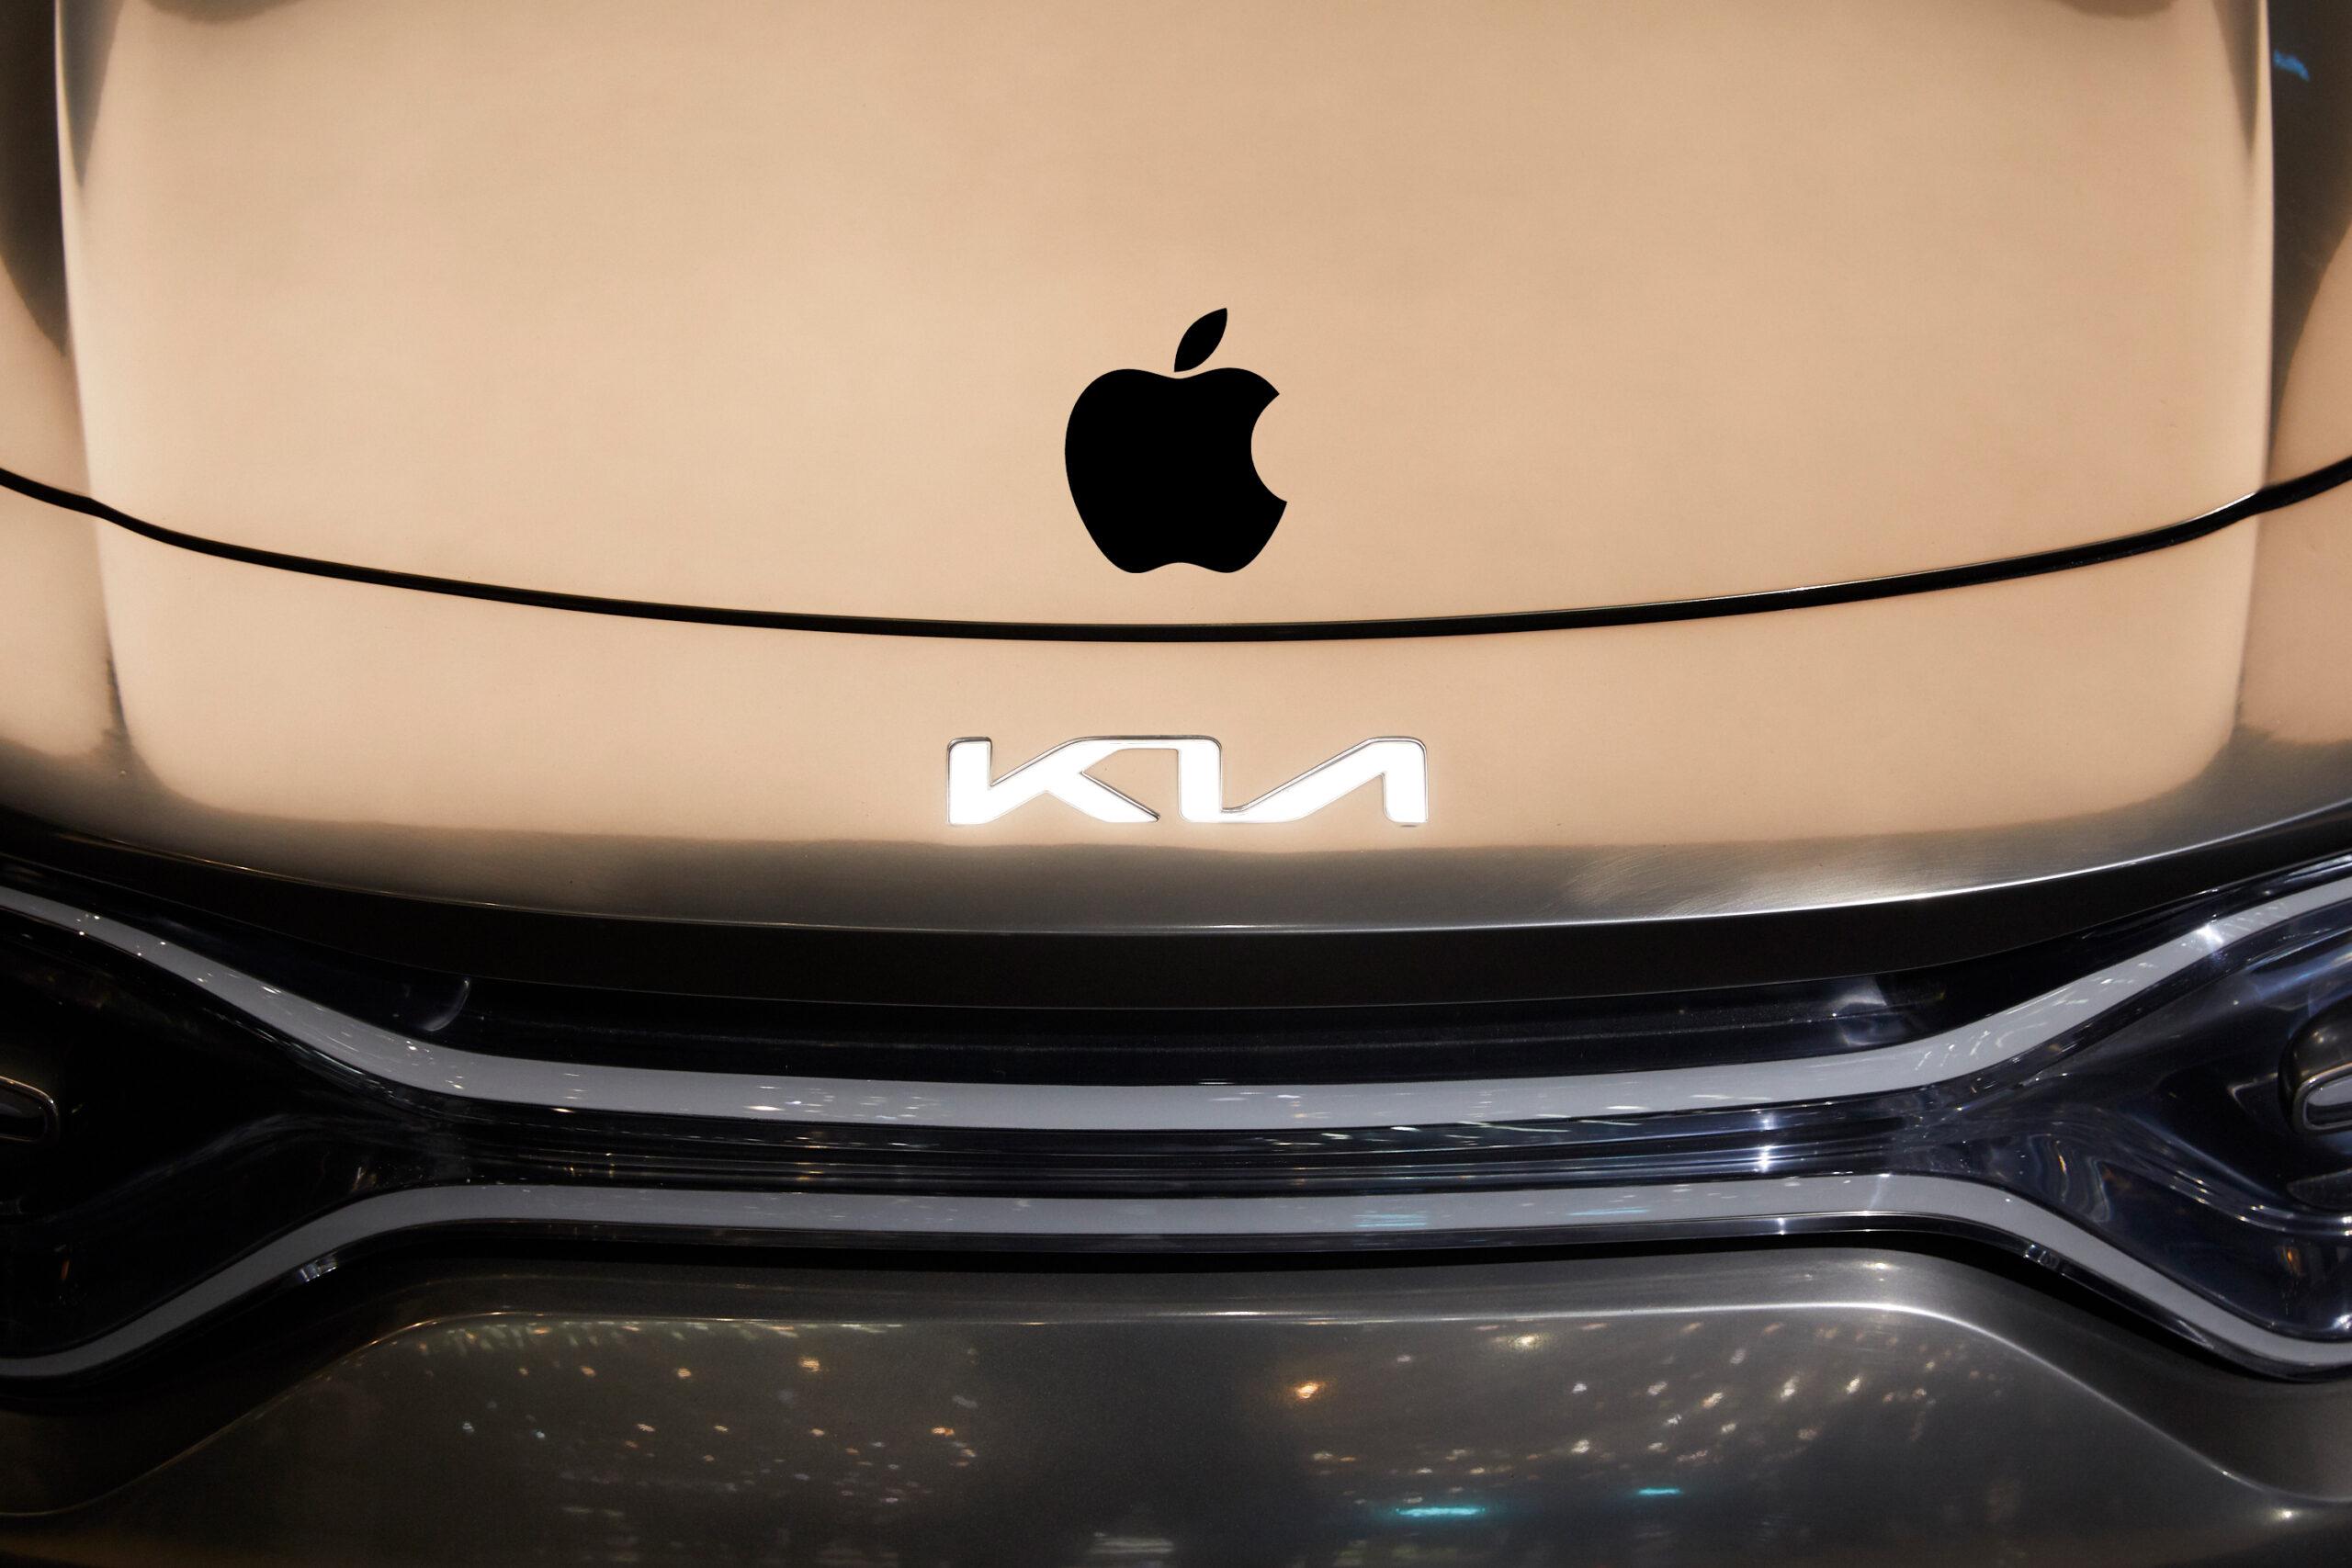 Apple Kia car